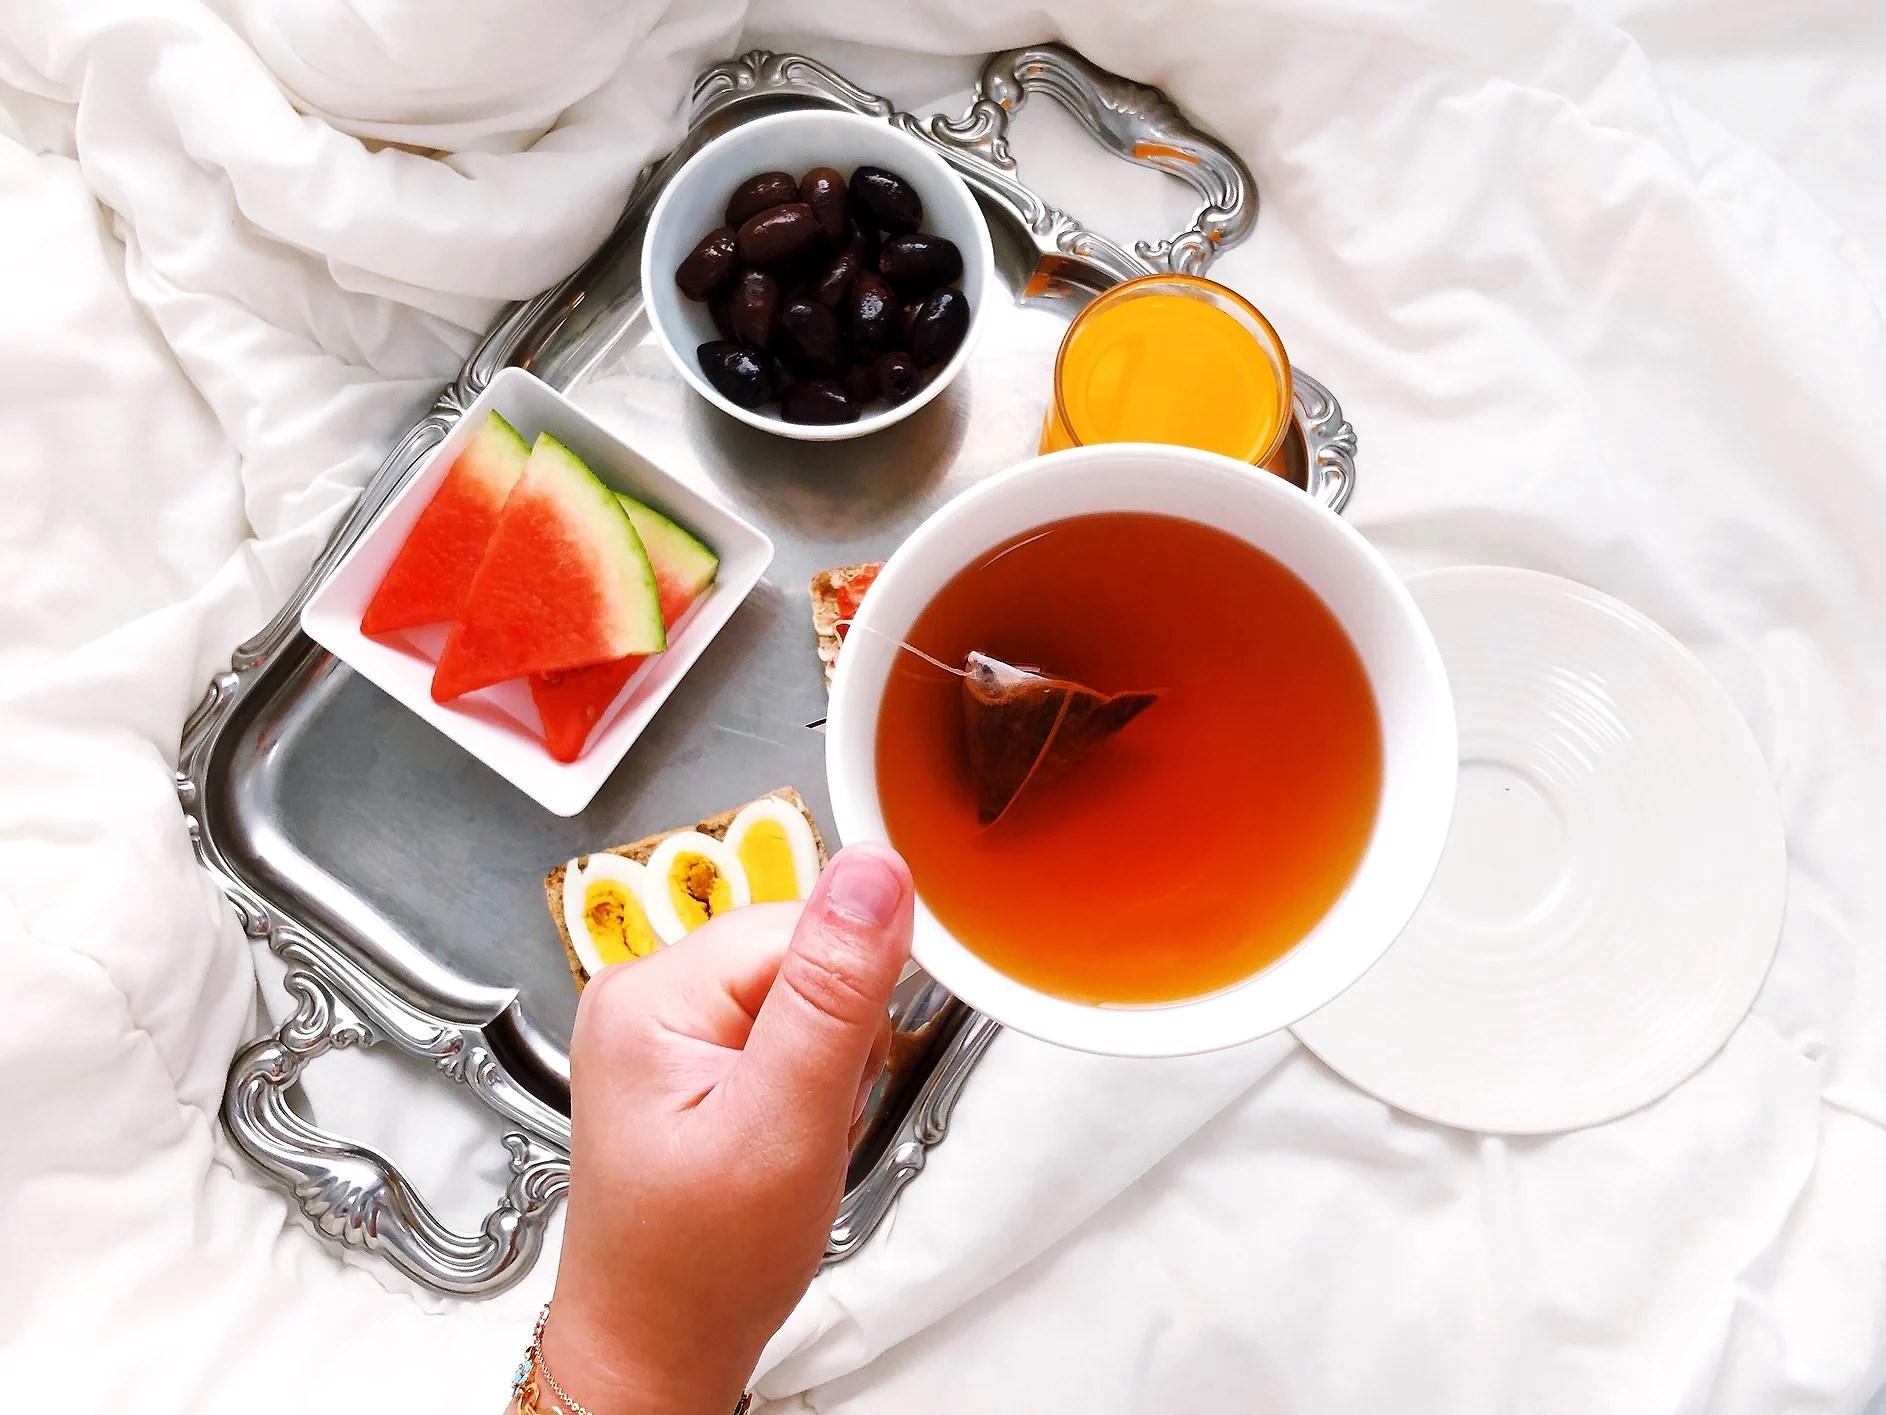 Brekkie in bed